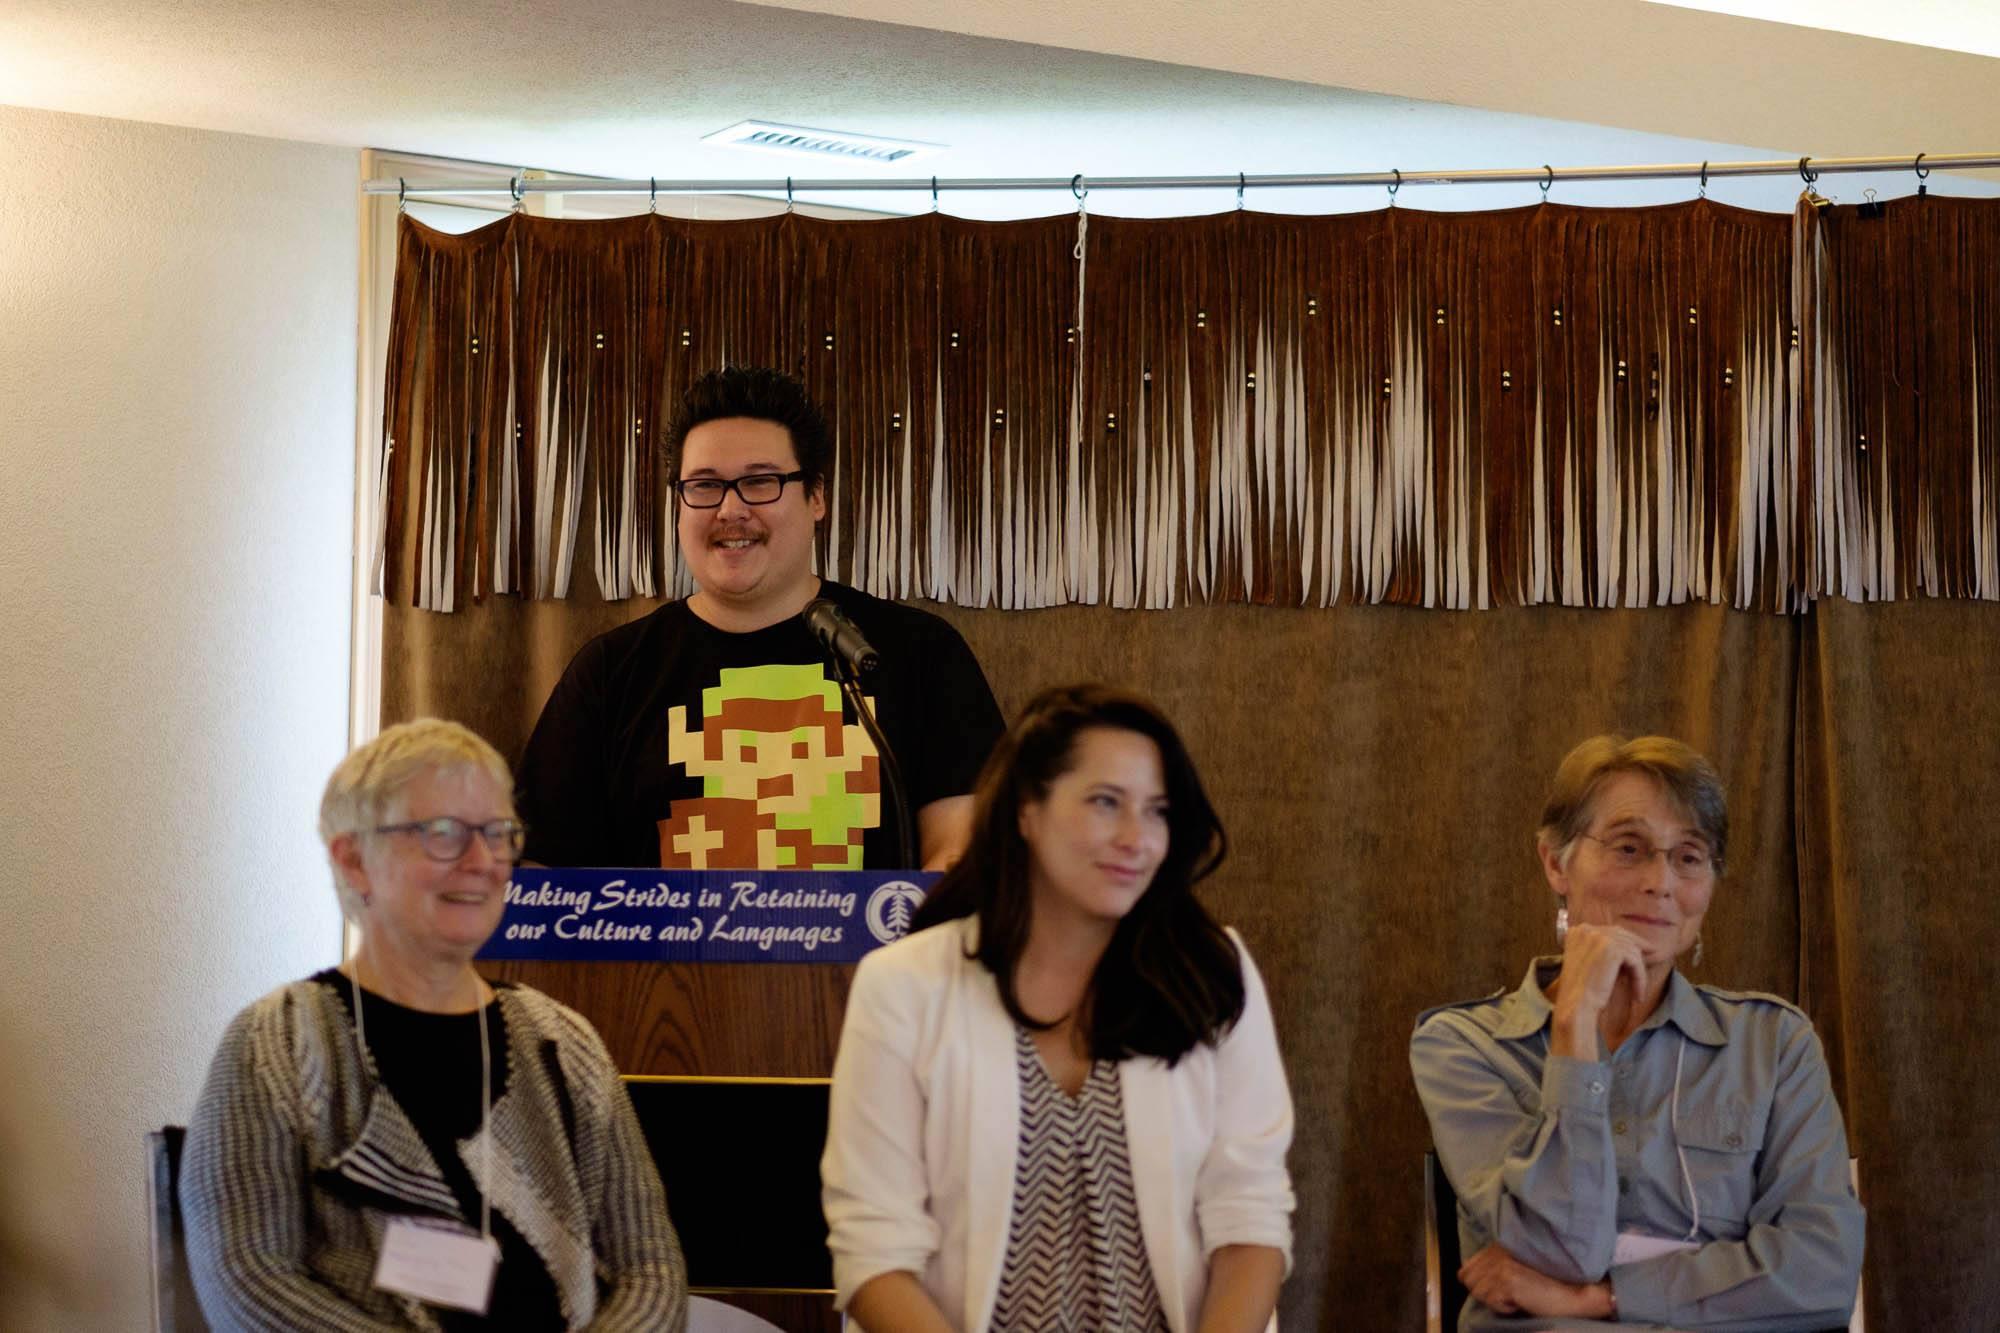 SFU and ubc scholars: jordan abel, margery fee, dory nason, and carole gerson